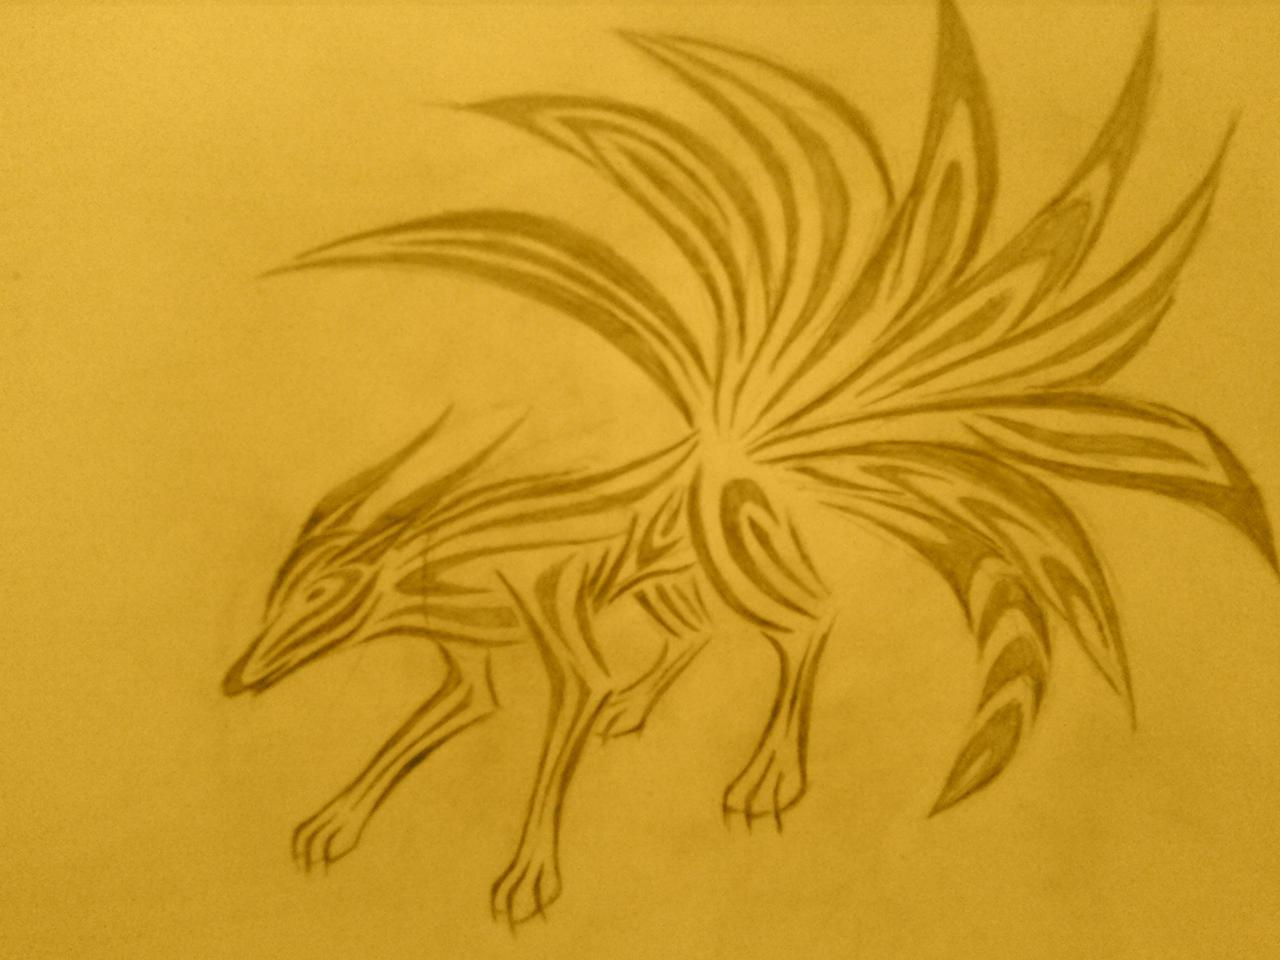 Tribal nine tailed fox tattoos